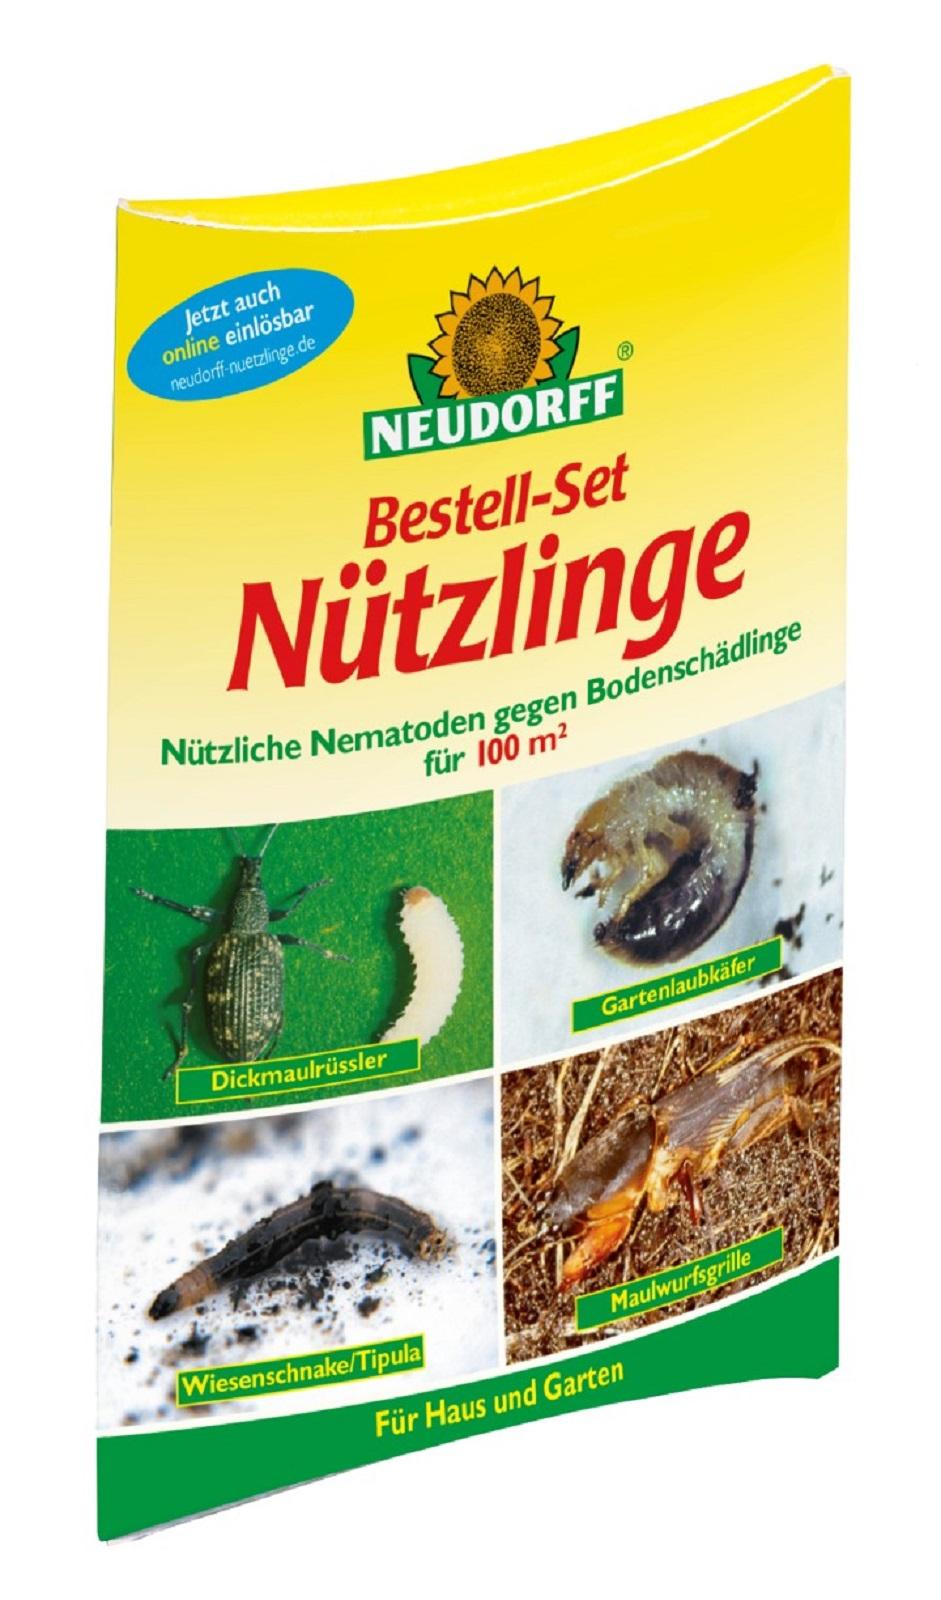 Neudorff Bestell-Set Nützlinge für Großflächen 100m²